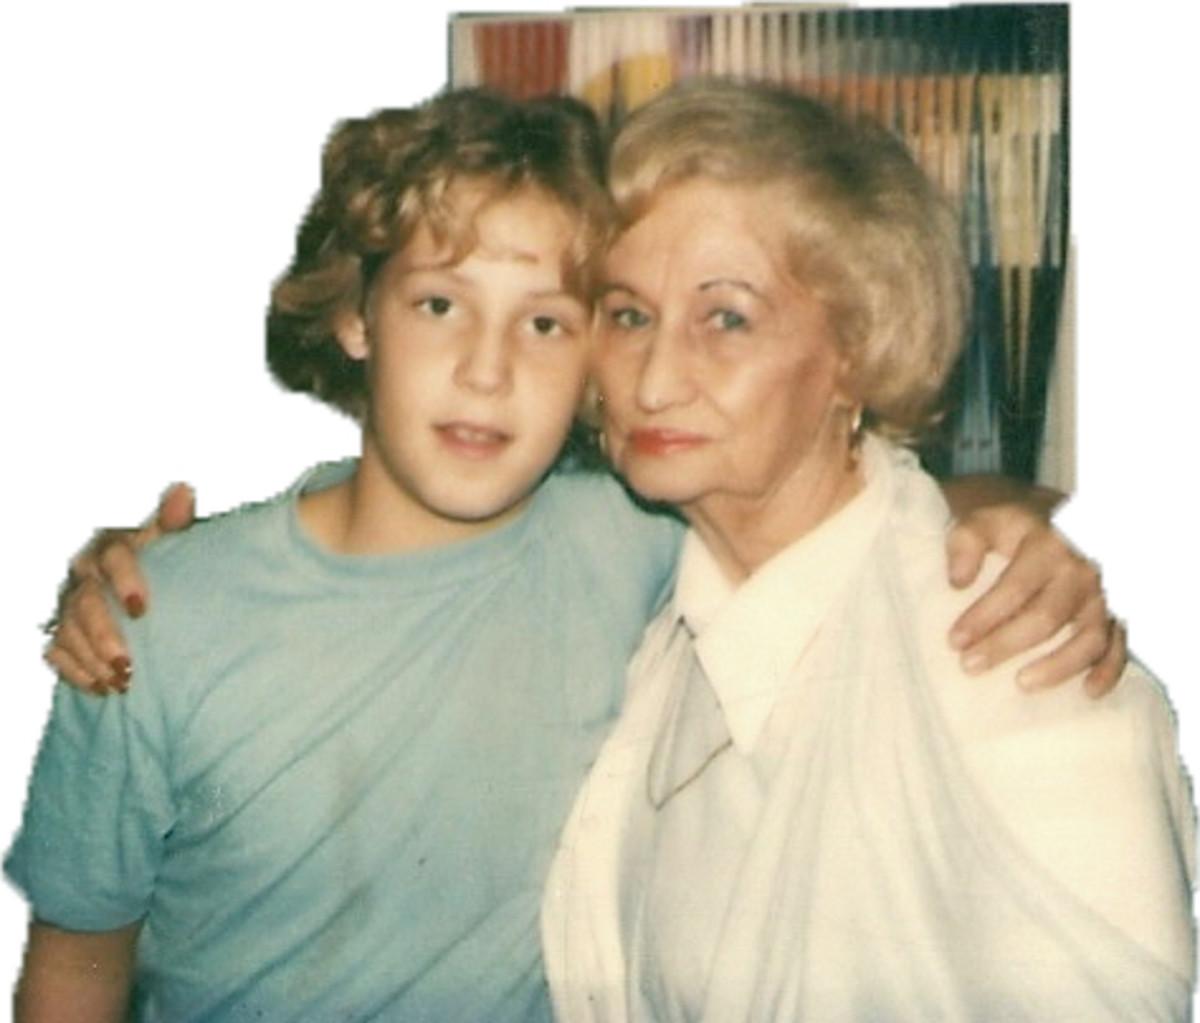 Peter Kellerman taking a photo with his paternal Grandmother Evelyn Kellerman (nee Kadis) otherwise known as Nana Sweetie.